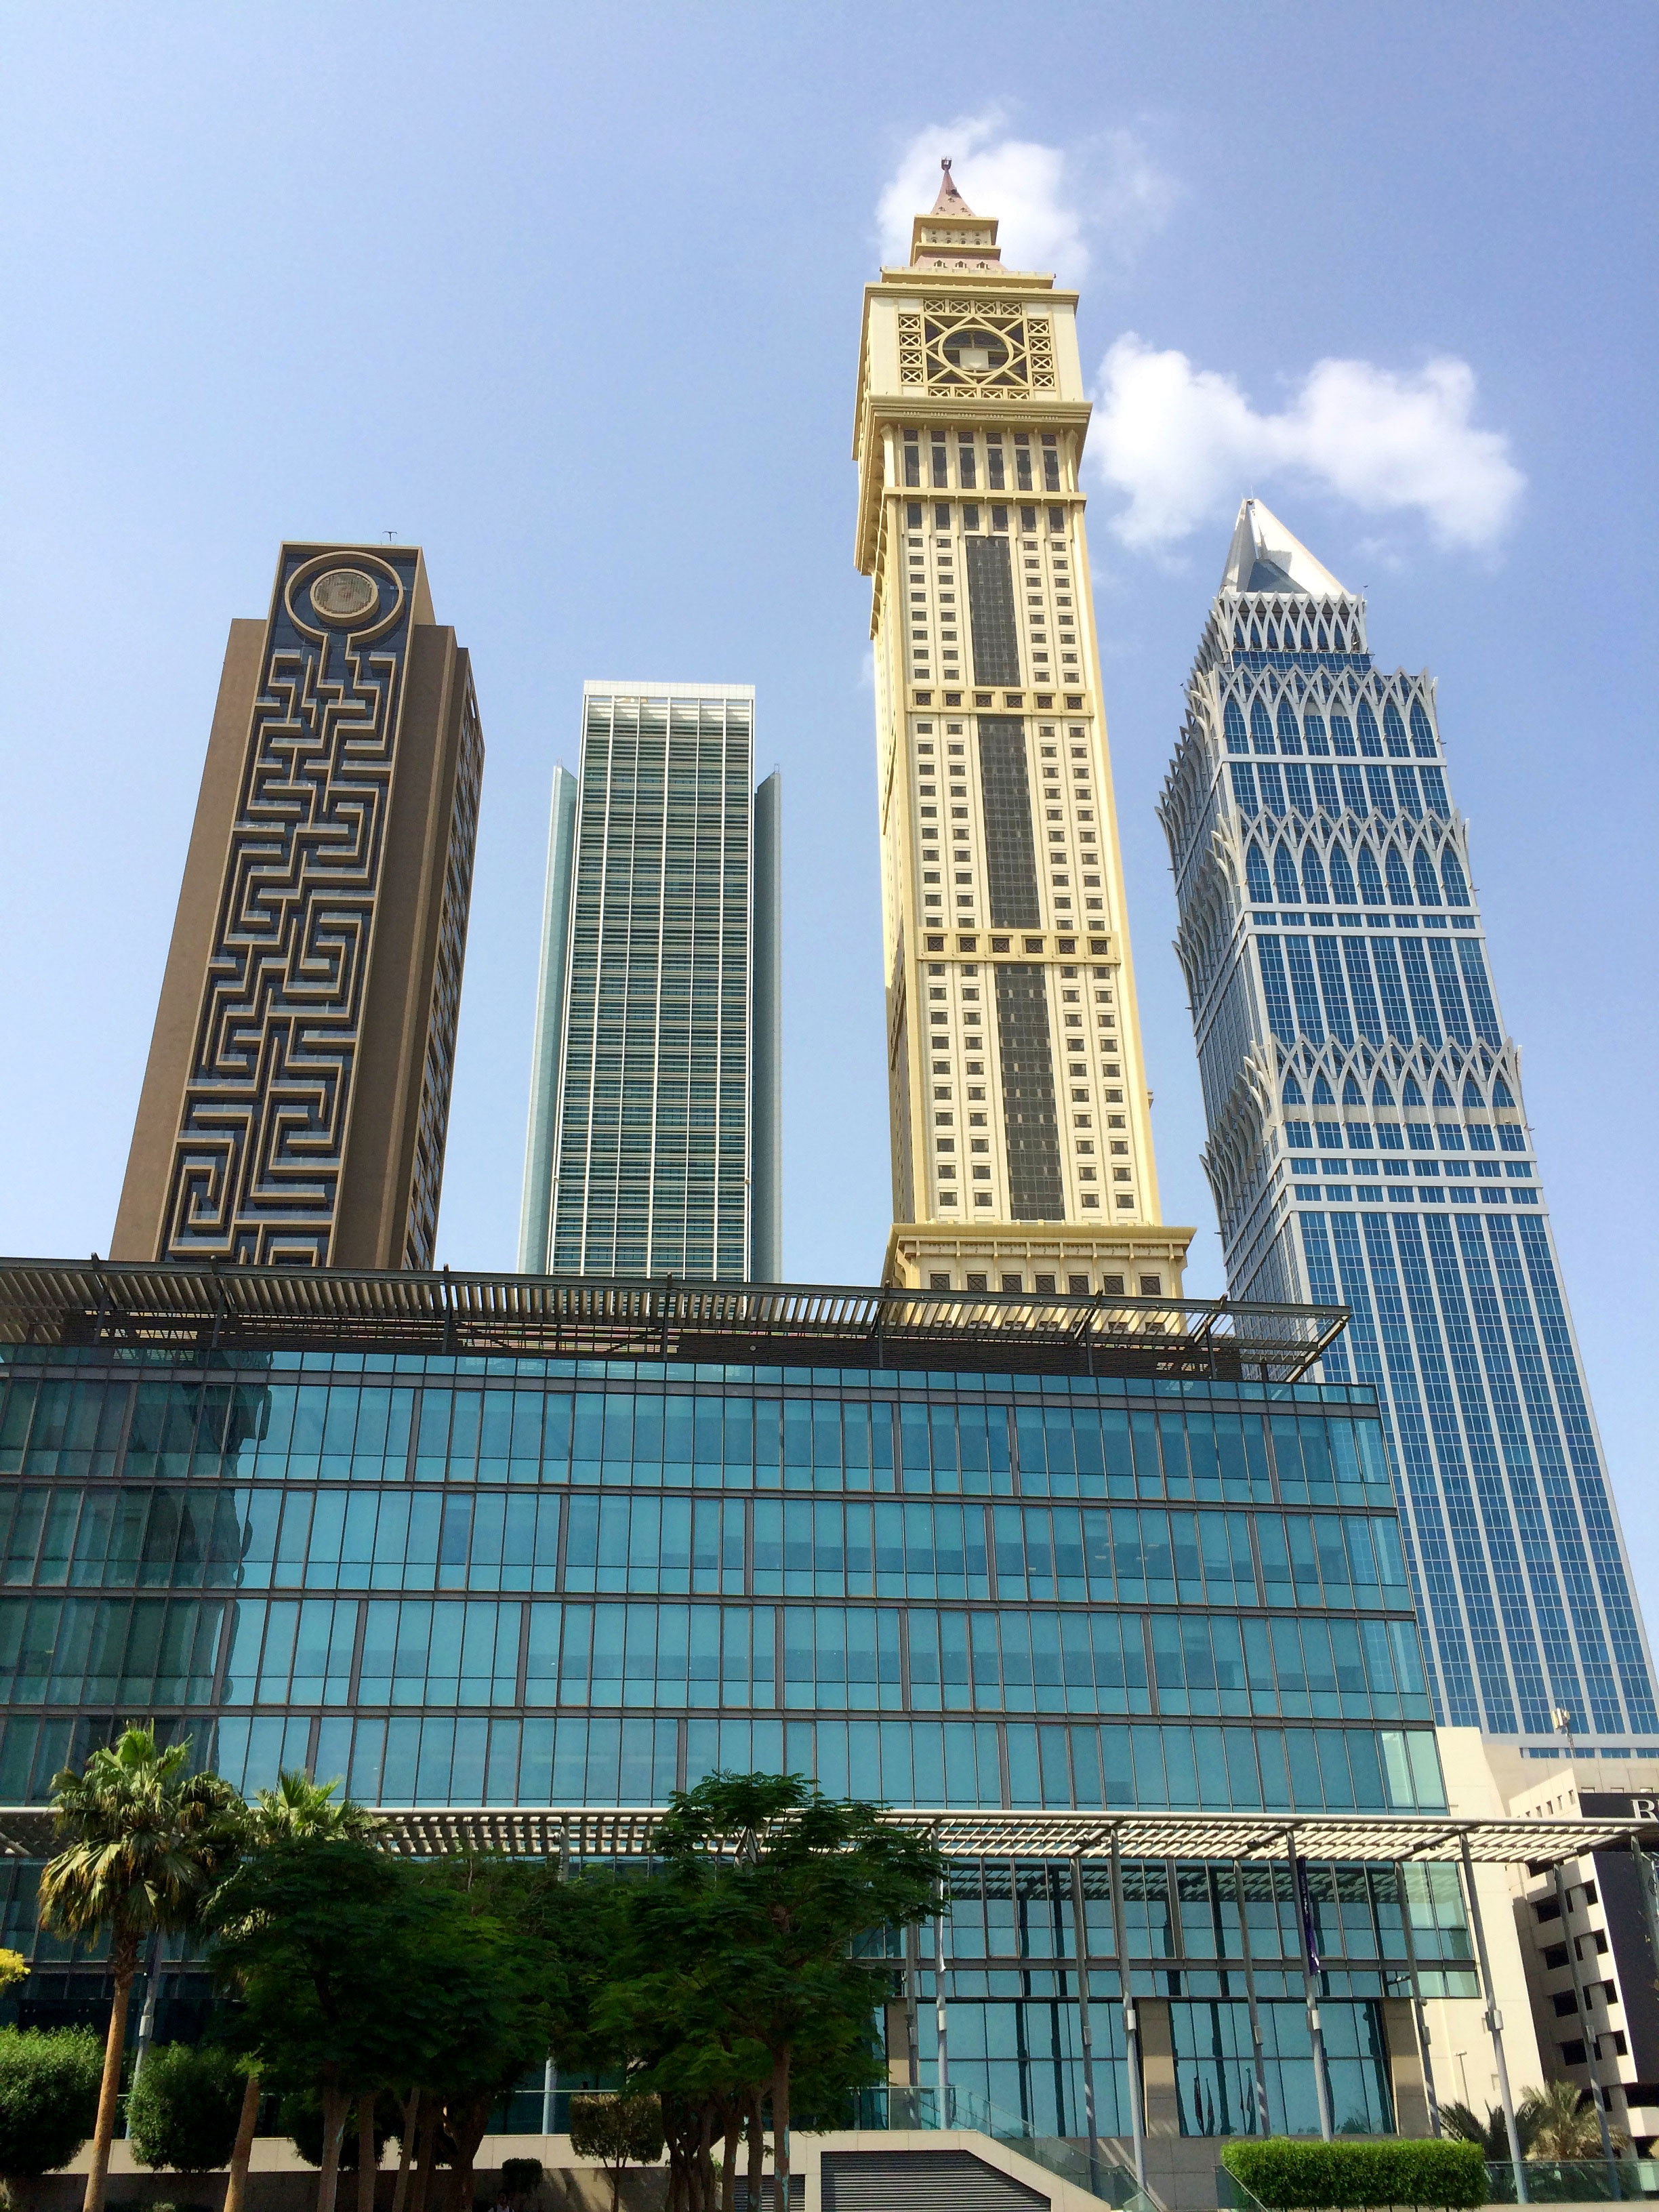 Al Yakoub Tower These are the coolest skyscraper buildings in Dubai